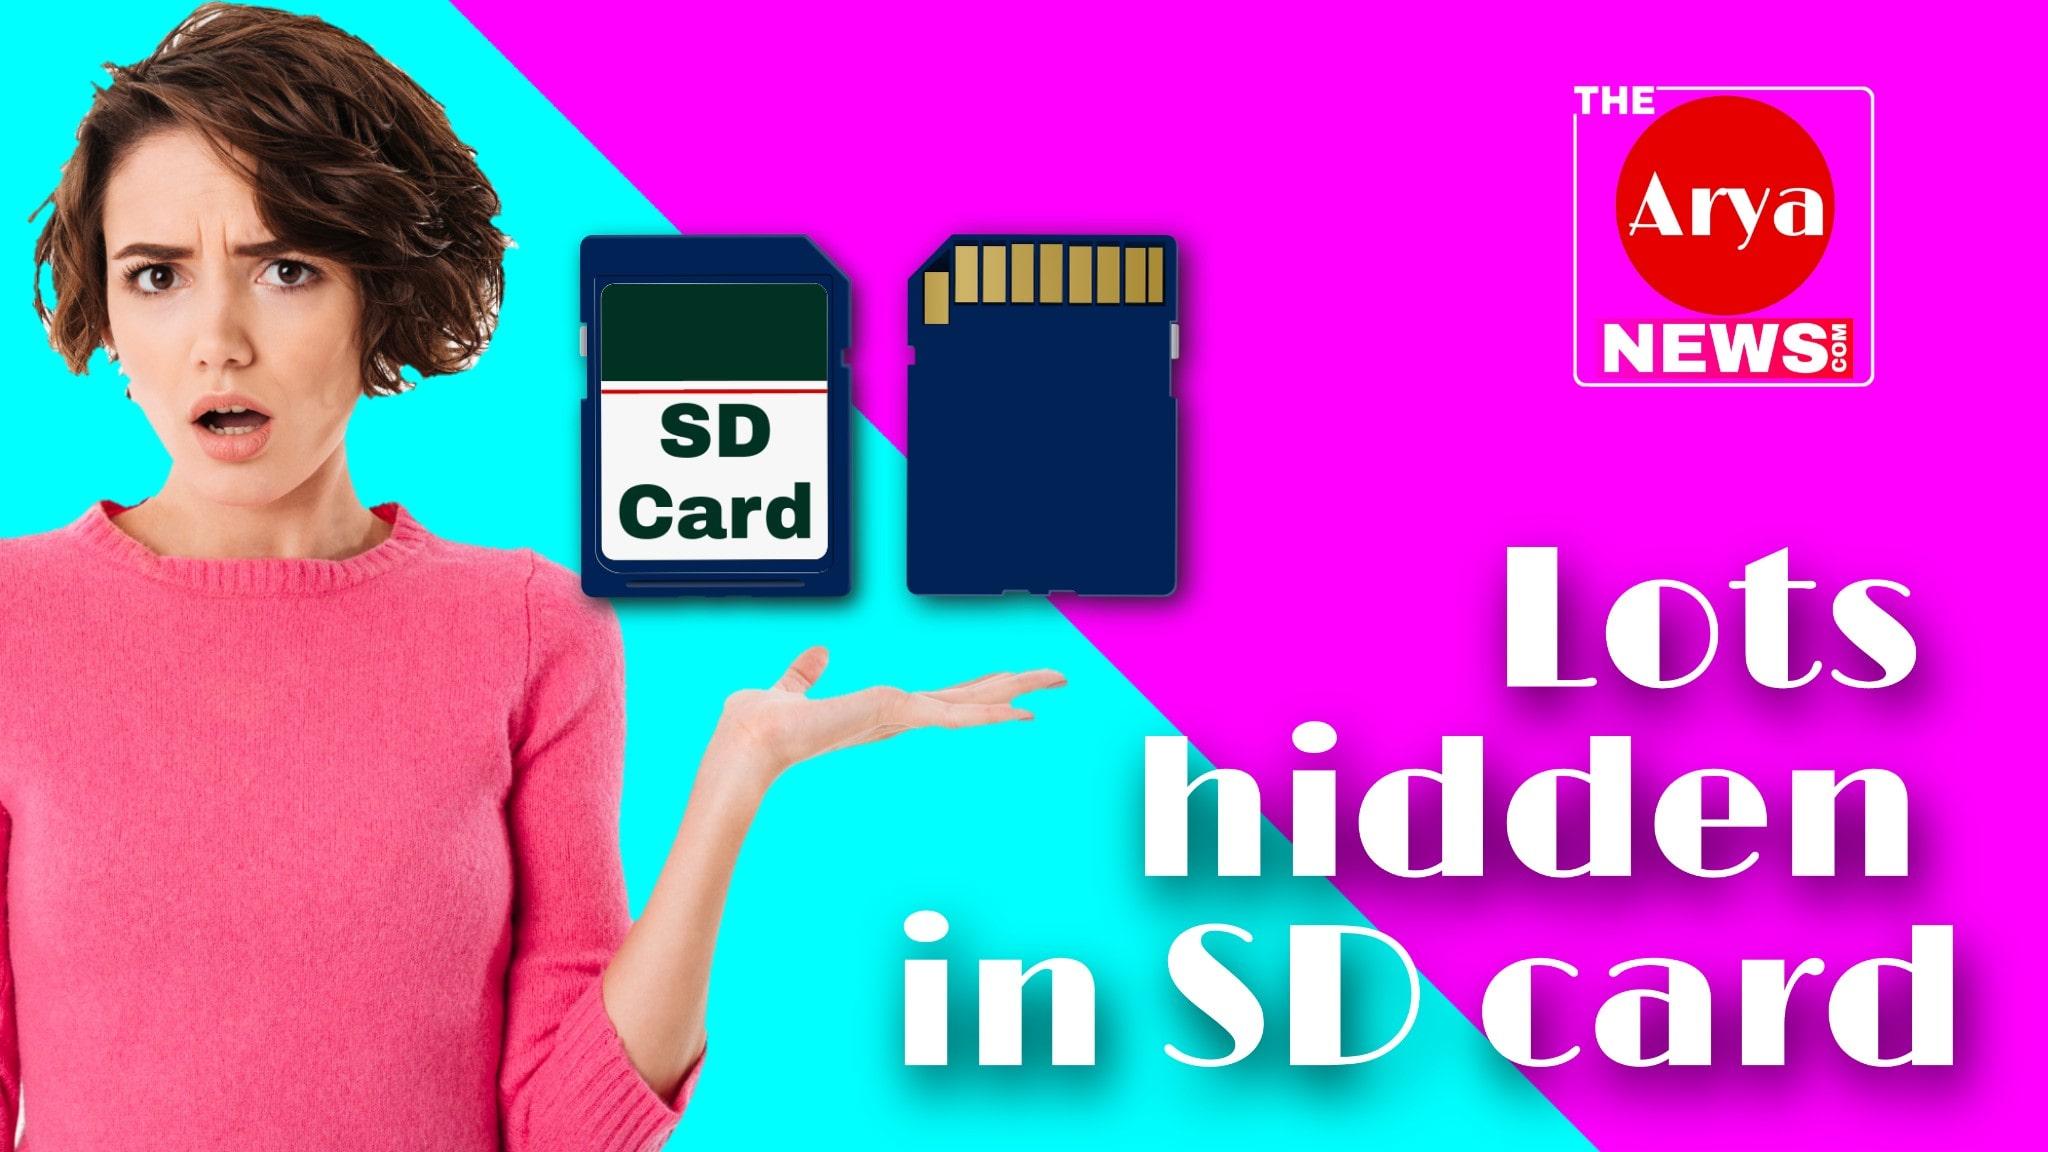 Lots hidden in SD card